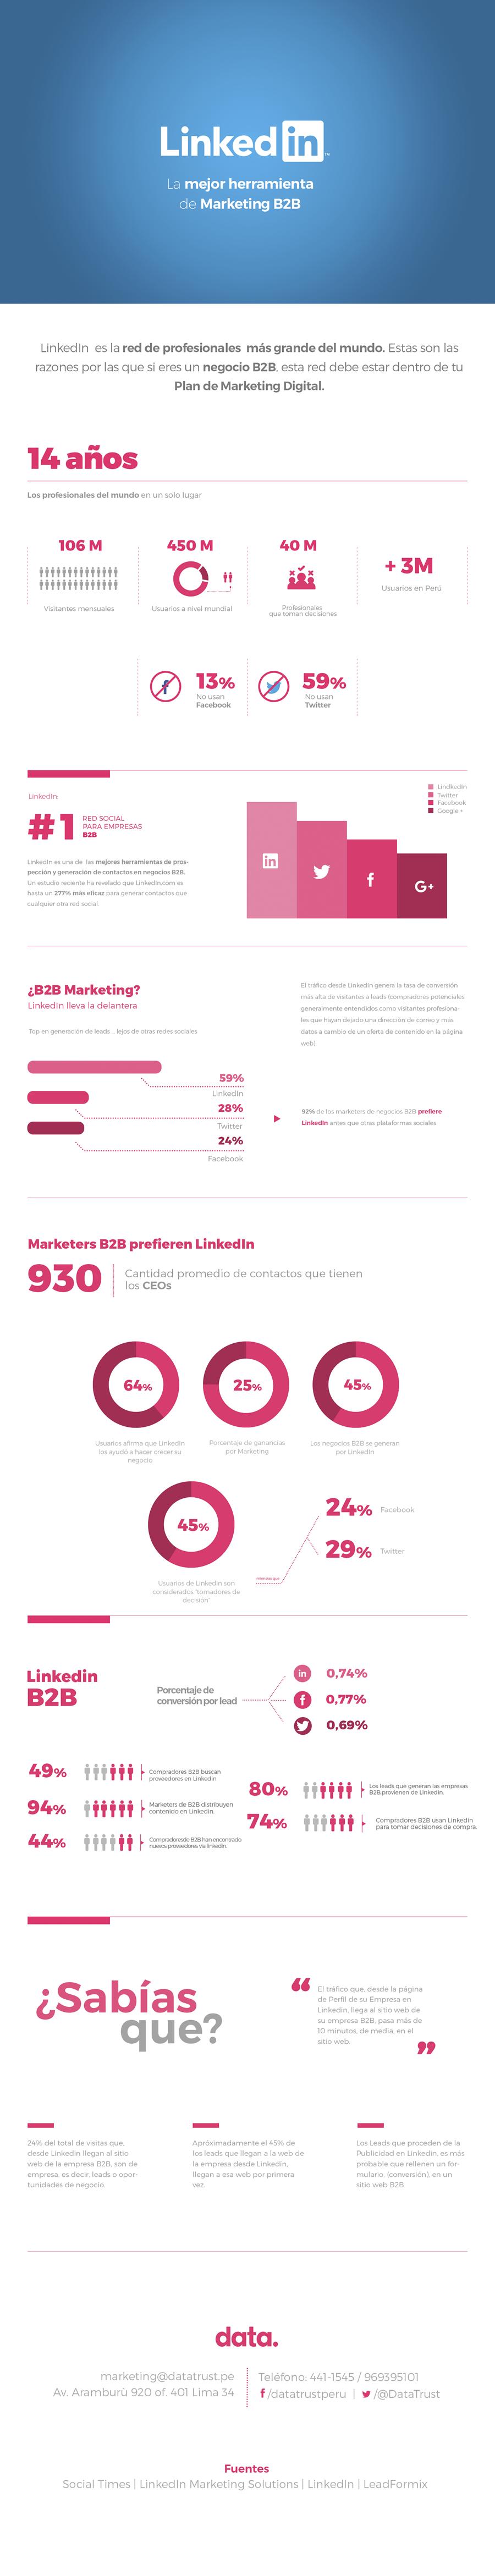 LinkedIn - La mejor herramienta de marketing B2B